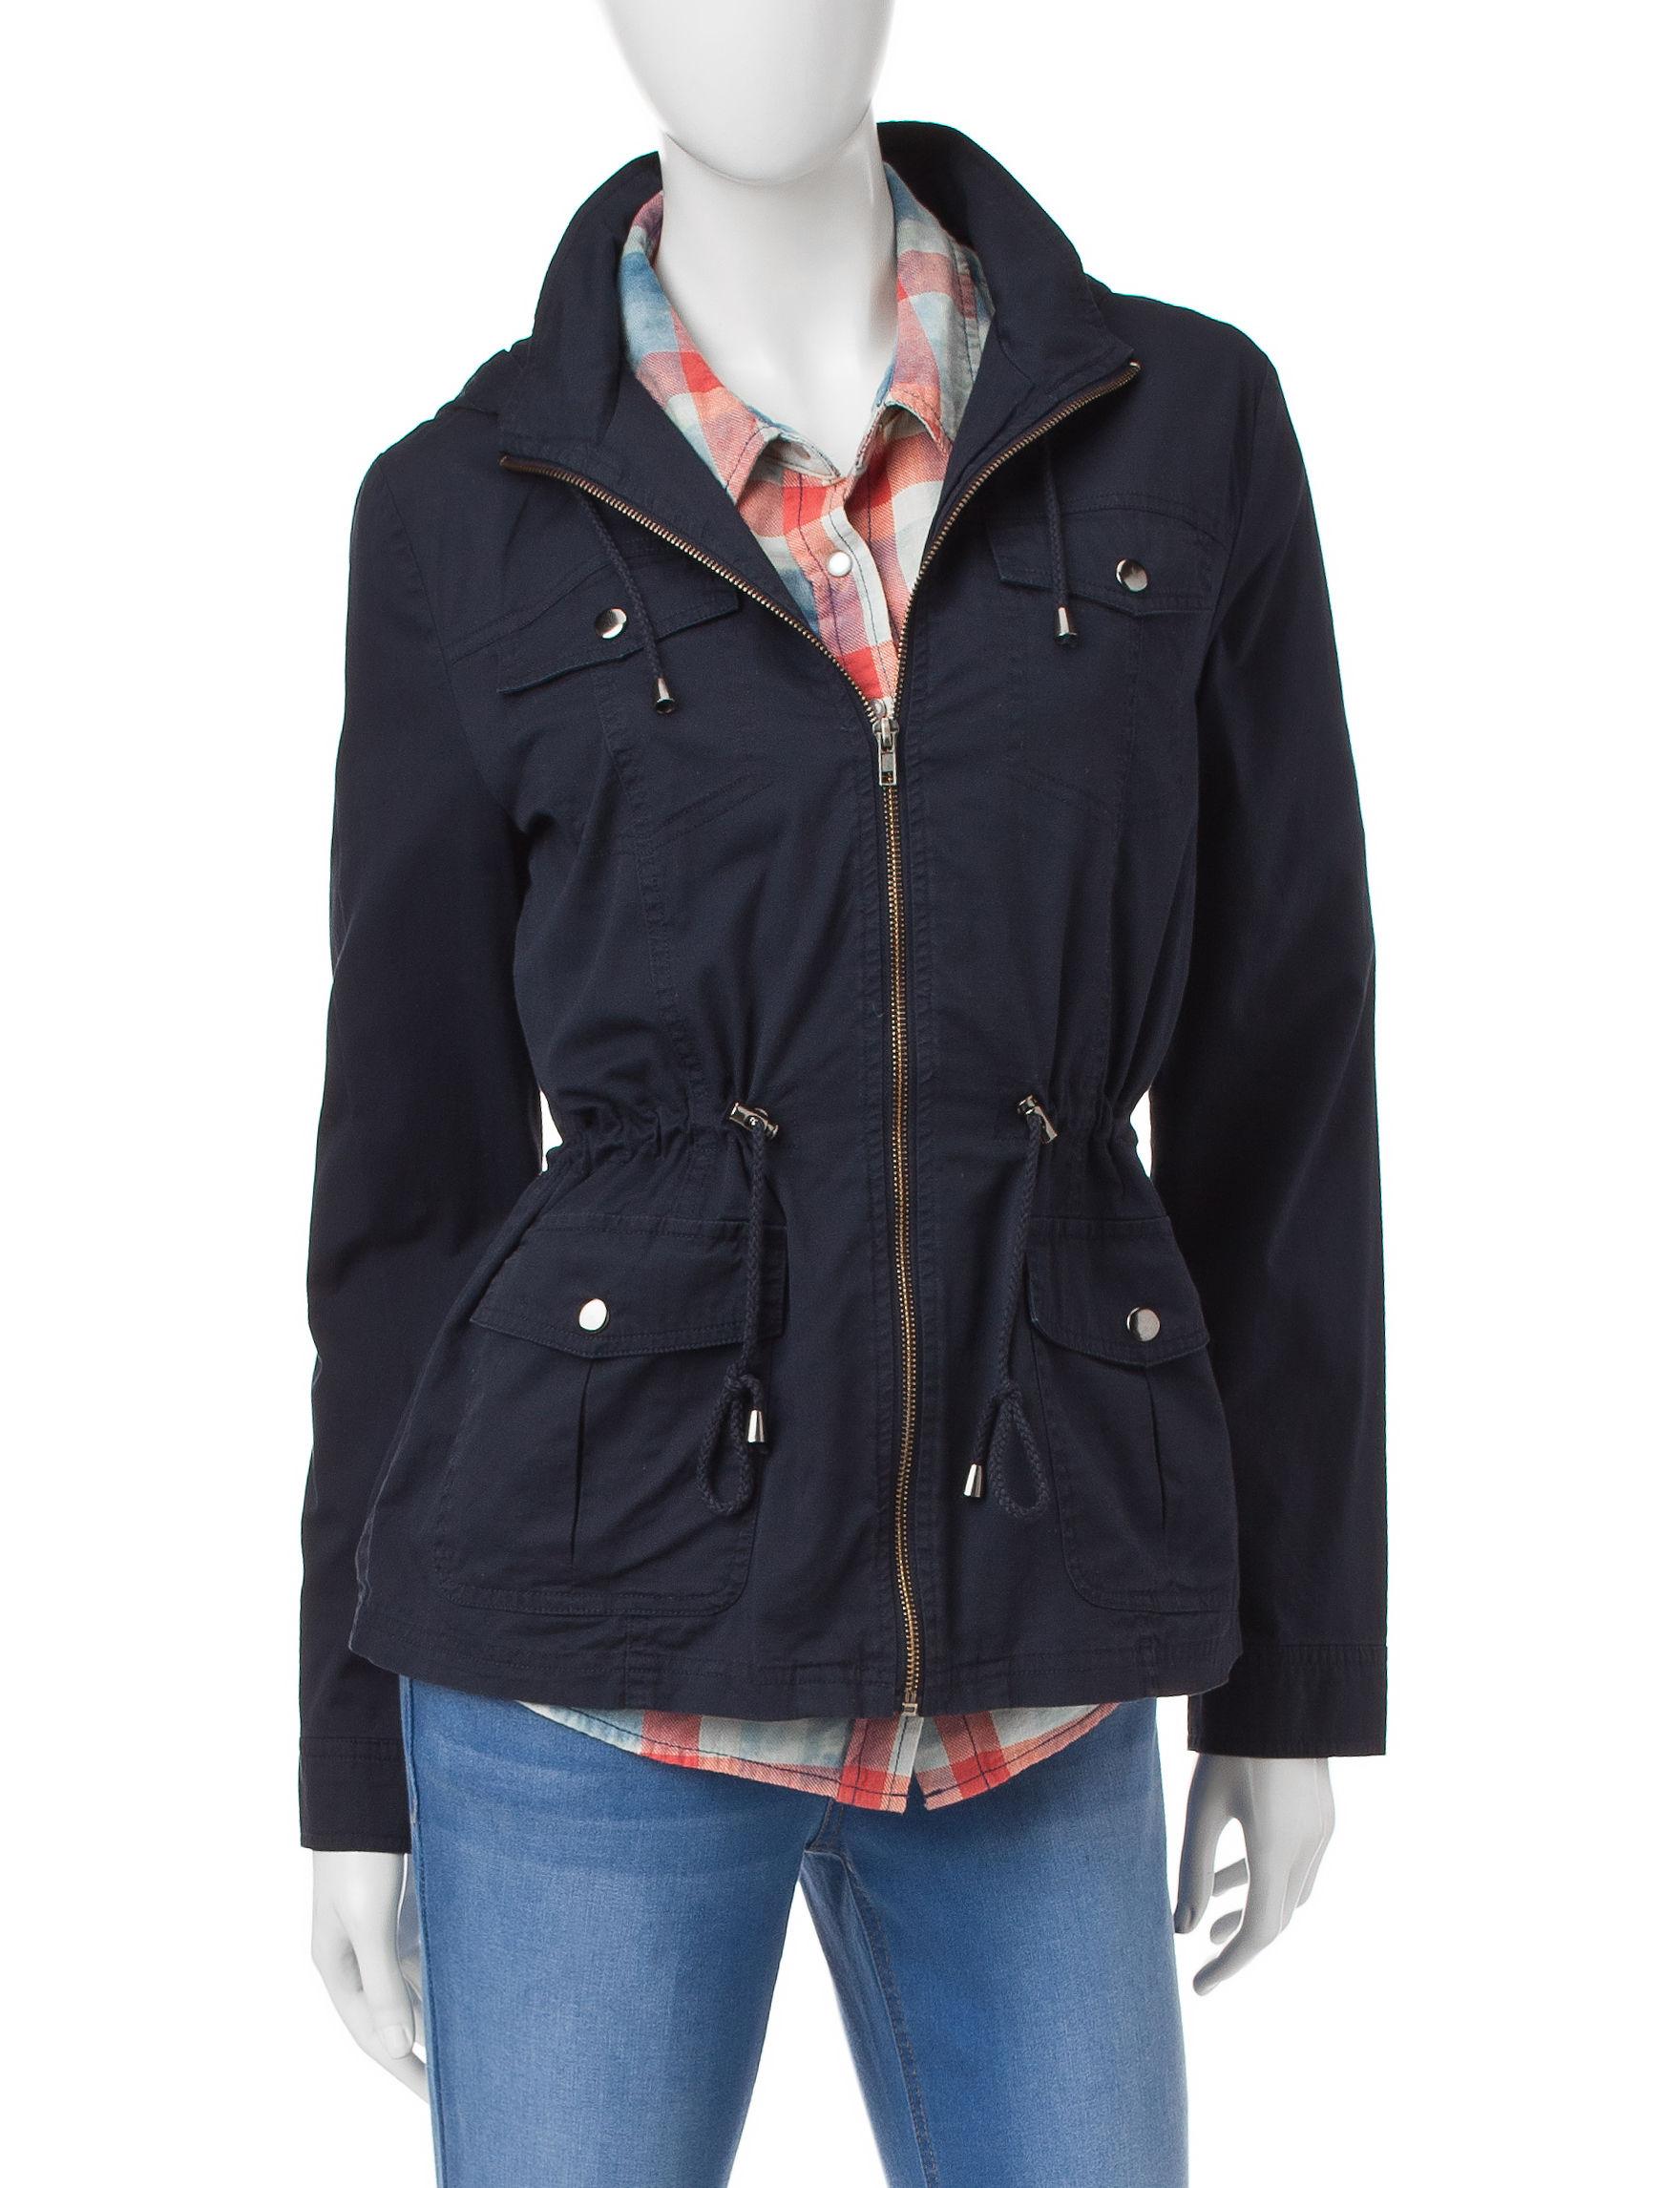 Ashley Navy Fleece & Soft Shell Jackets